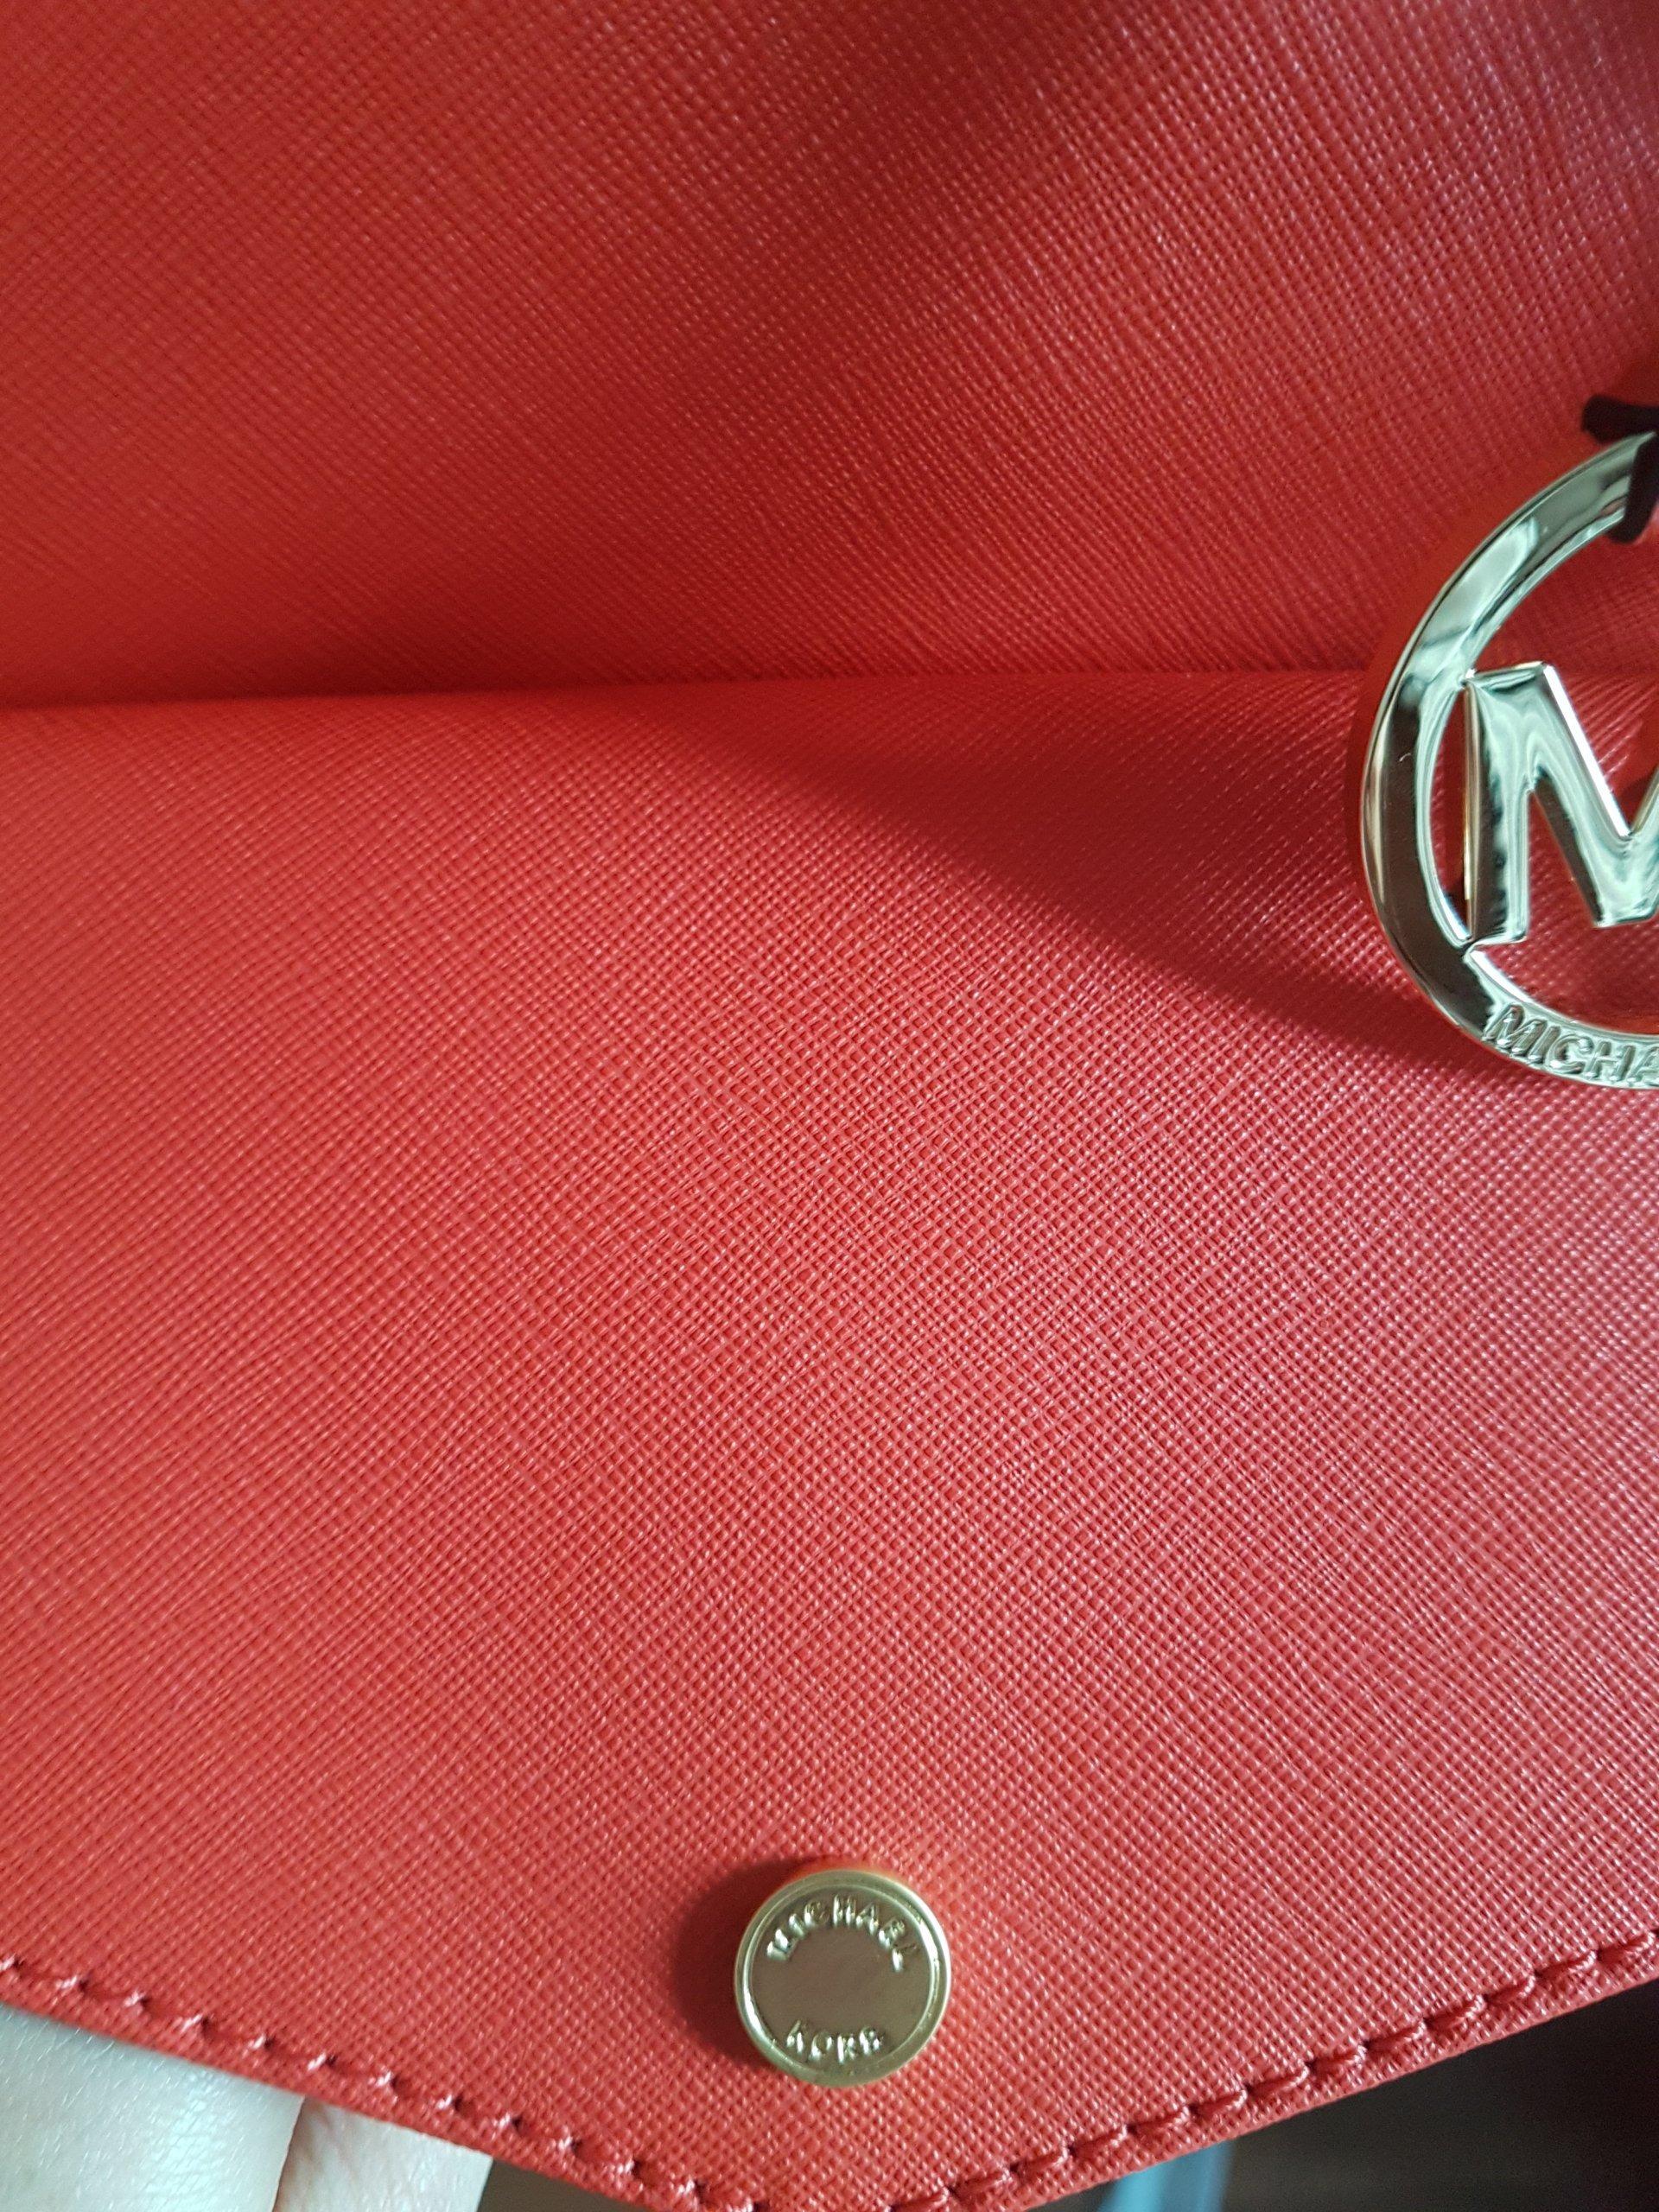 20ab01324f735 Michael Kors MK gwiazdka prezent torba torebka sko - 7099833997 ...